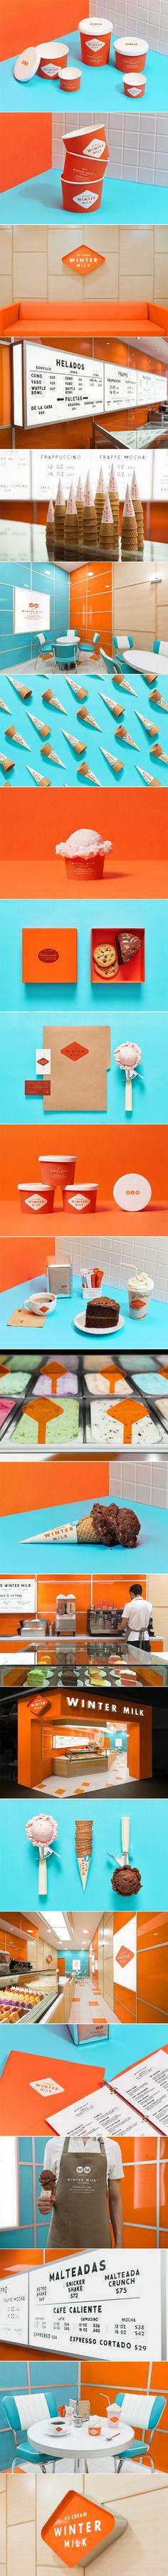 We Love The Retro Inspired Branding For This Ice Cream Shop — The Dieline   Packaging & Branding Design & Innovation News